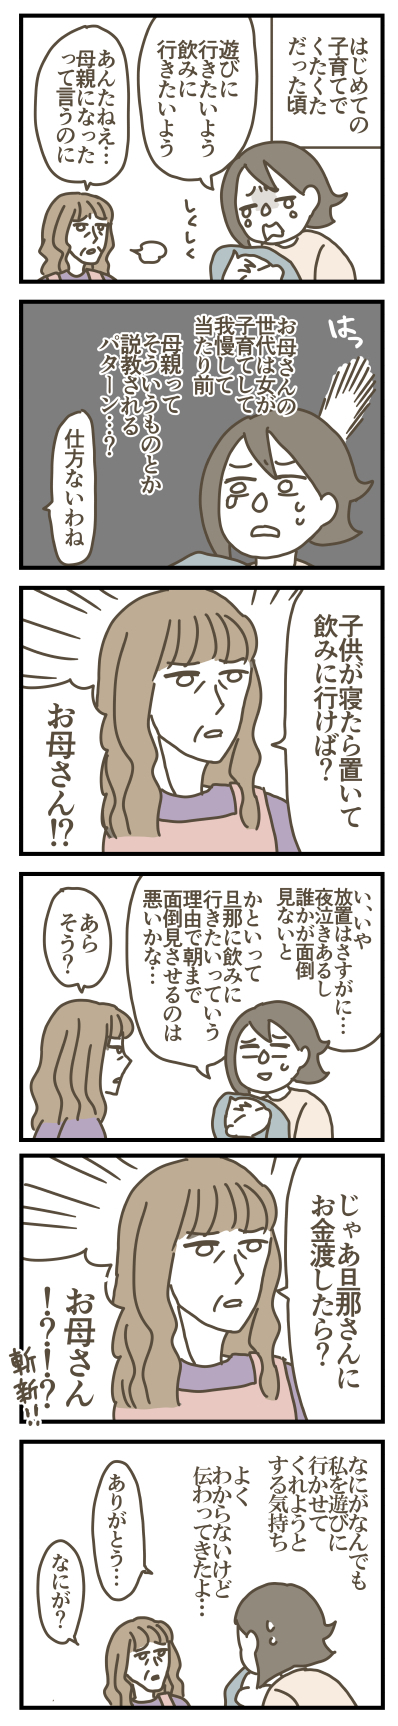 f:id:kanemotonomukuu:20170730160335j:plain